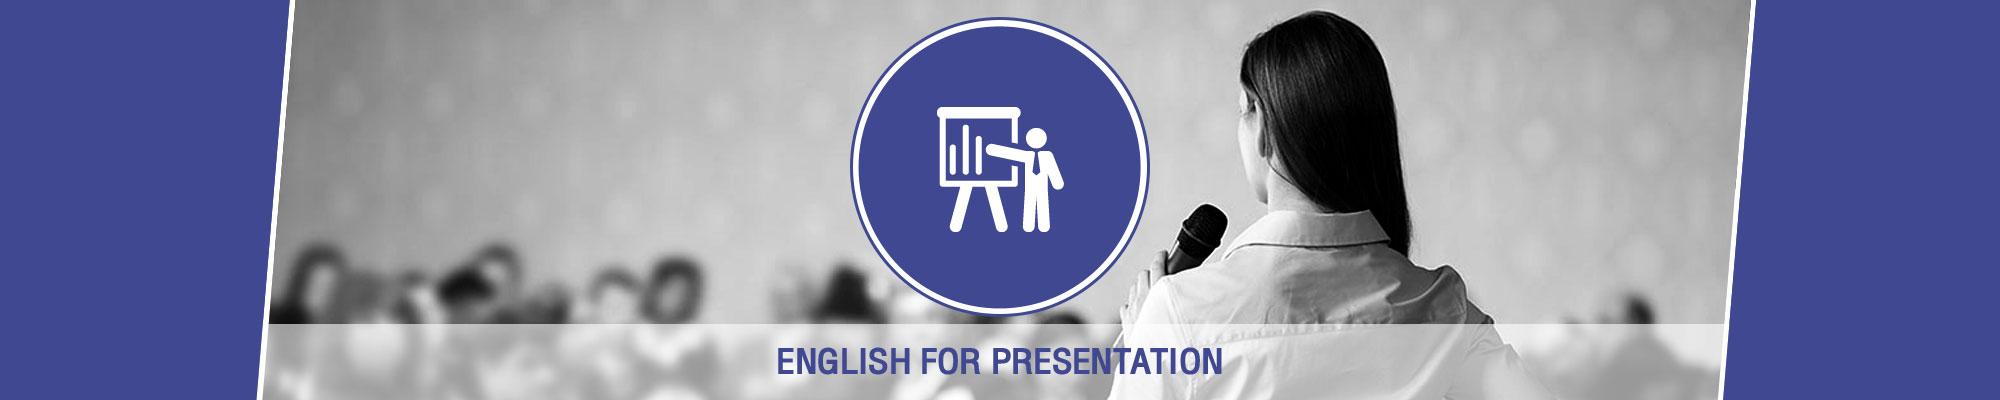 Anglokom Corporate Language Training Bangkok -English for Presentations